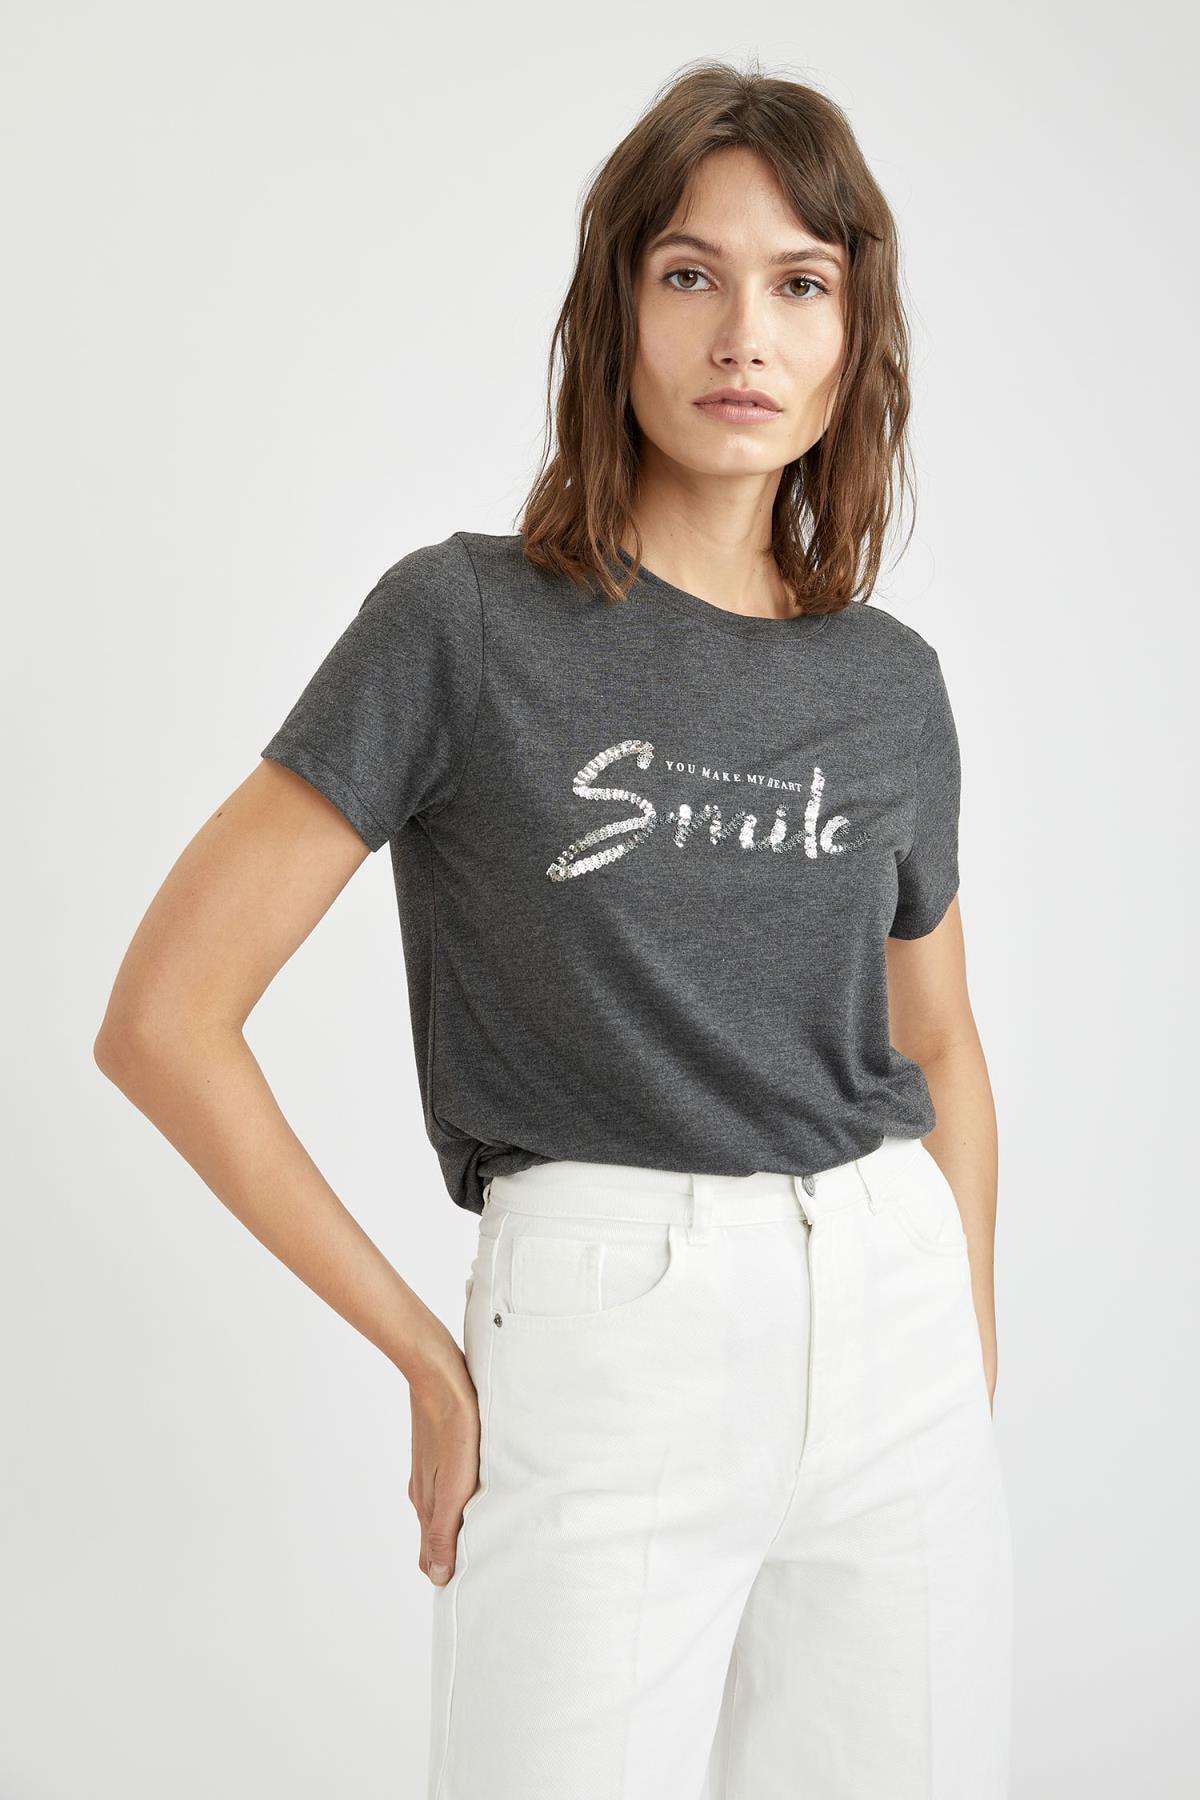 Slogan Payet Baskılı Relax Fit Kısa Kollu Tişört